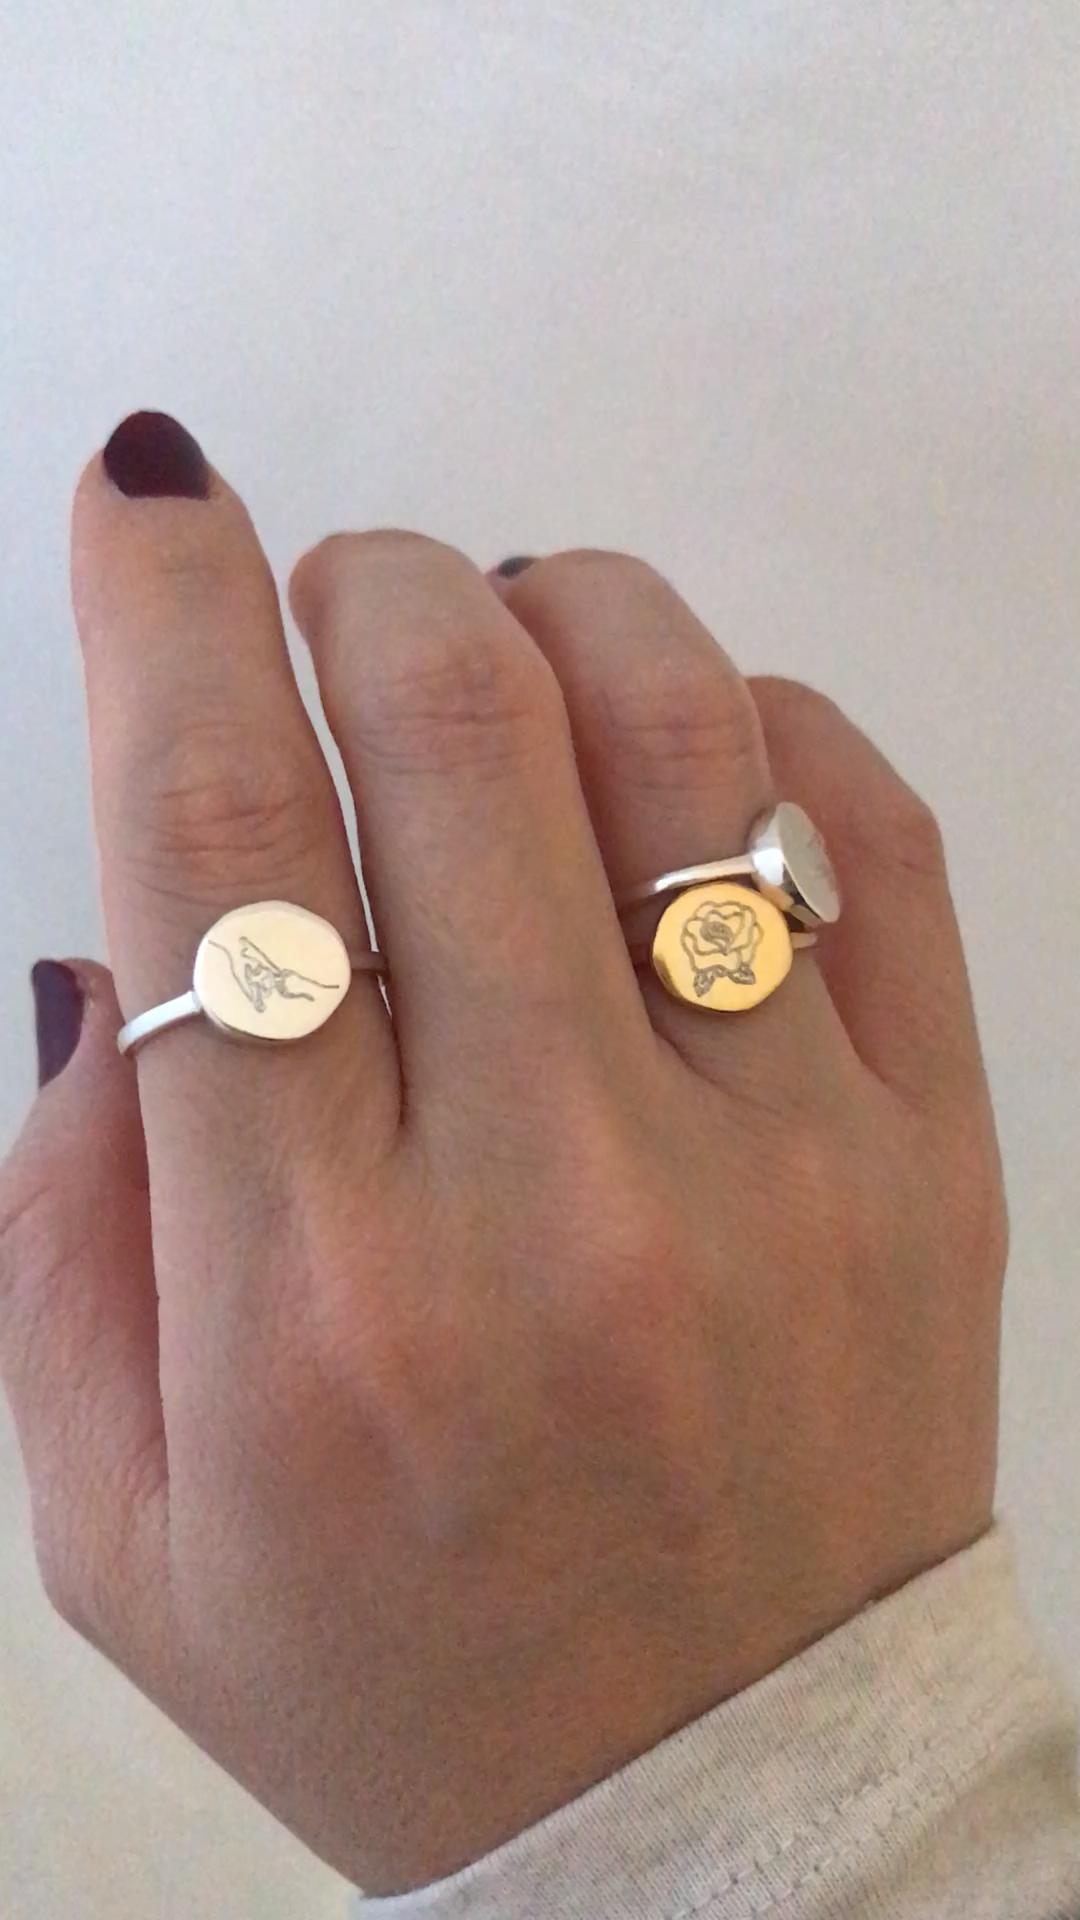 Organic shape signet rings with art